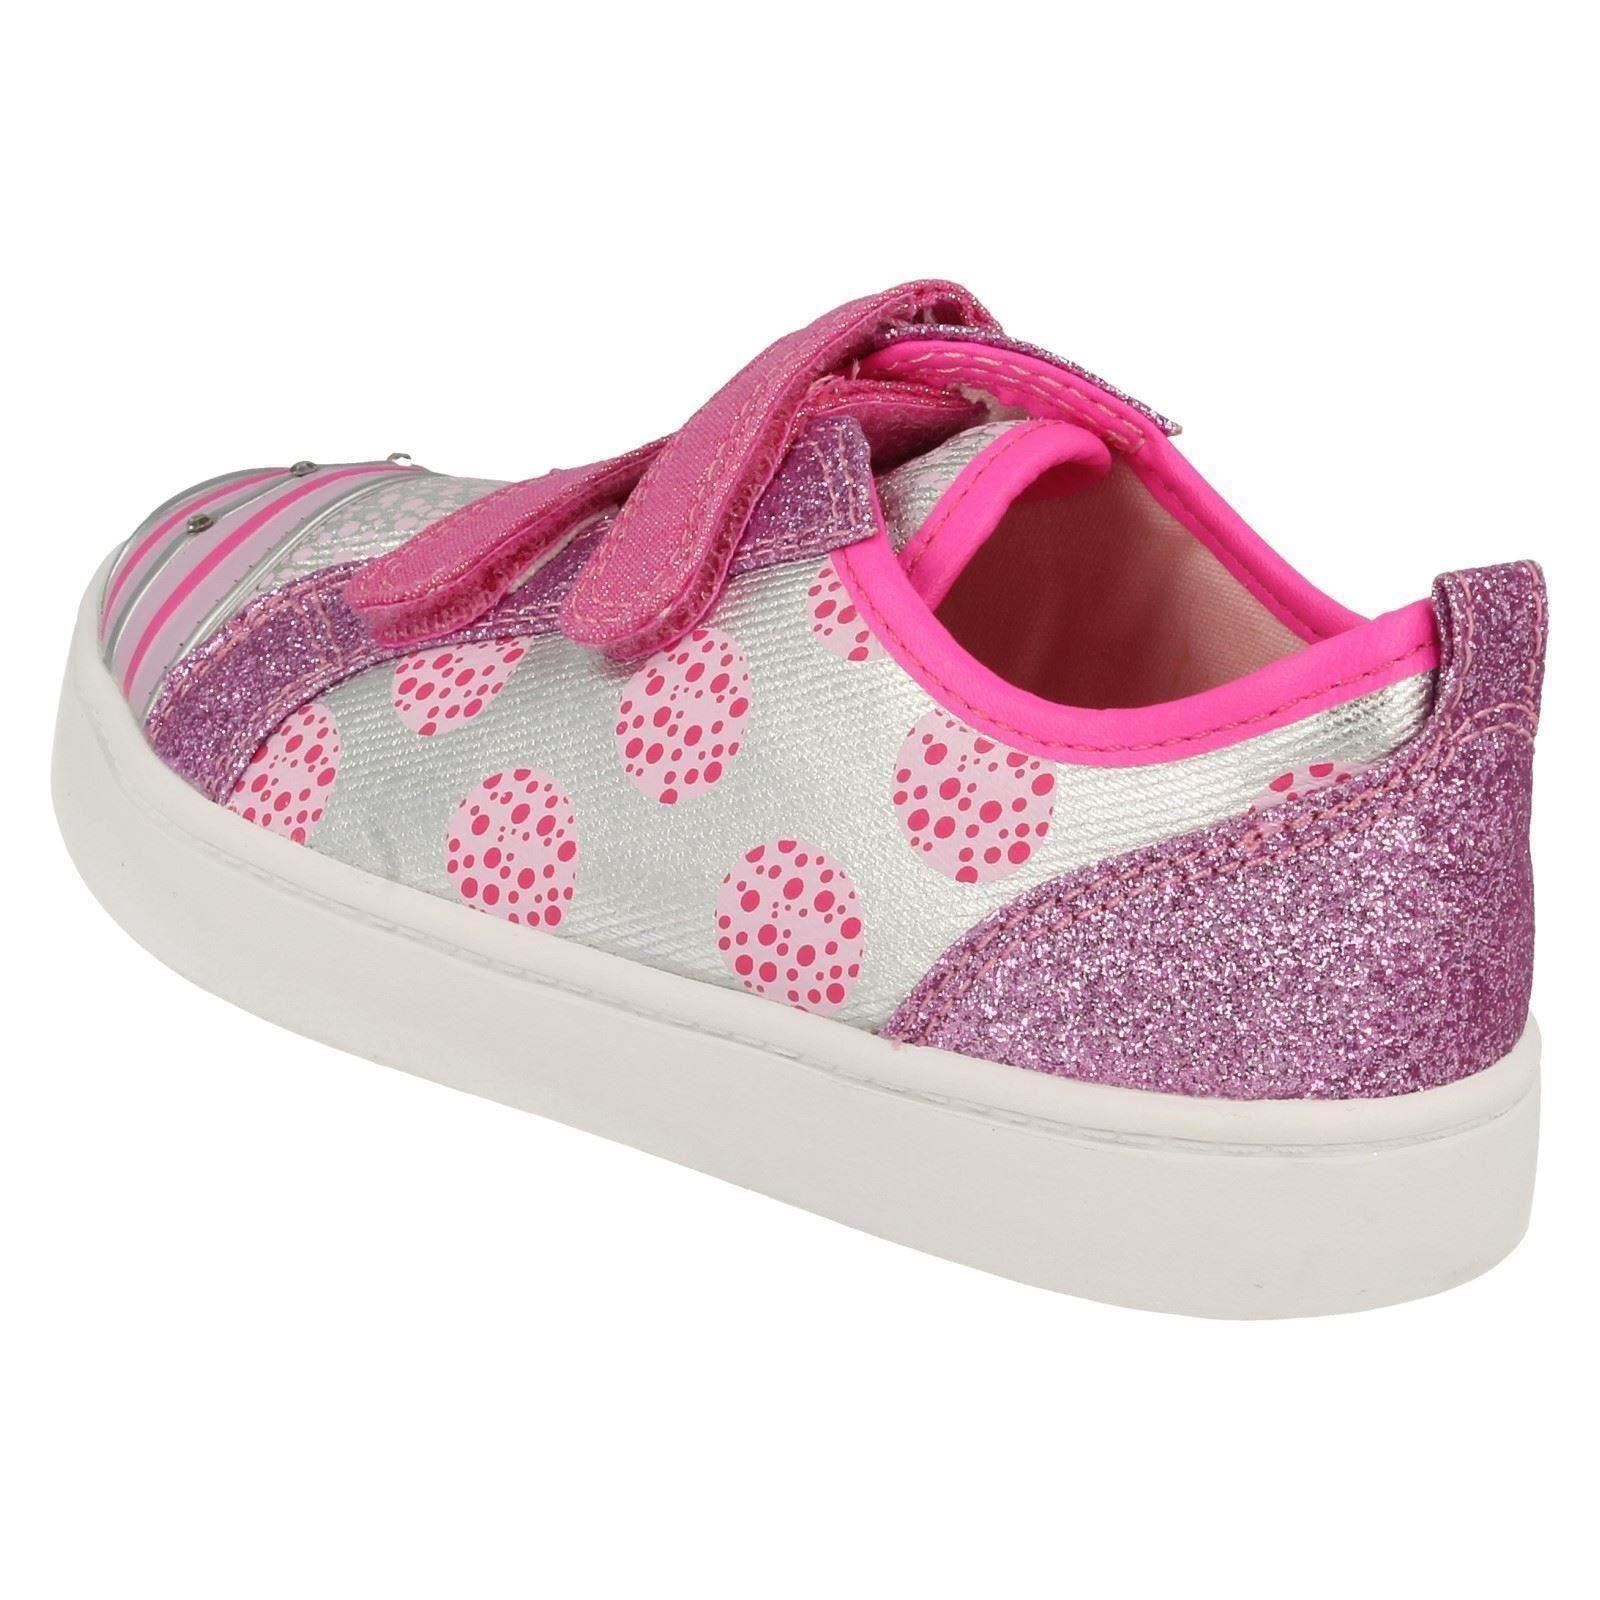 Clarks Girls Casual Canvas Shoes Pattie Jo